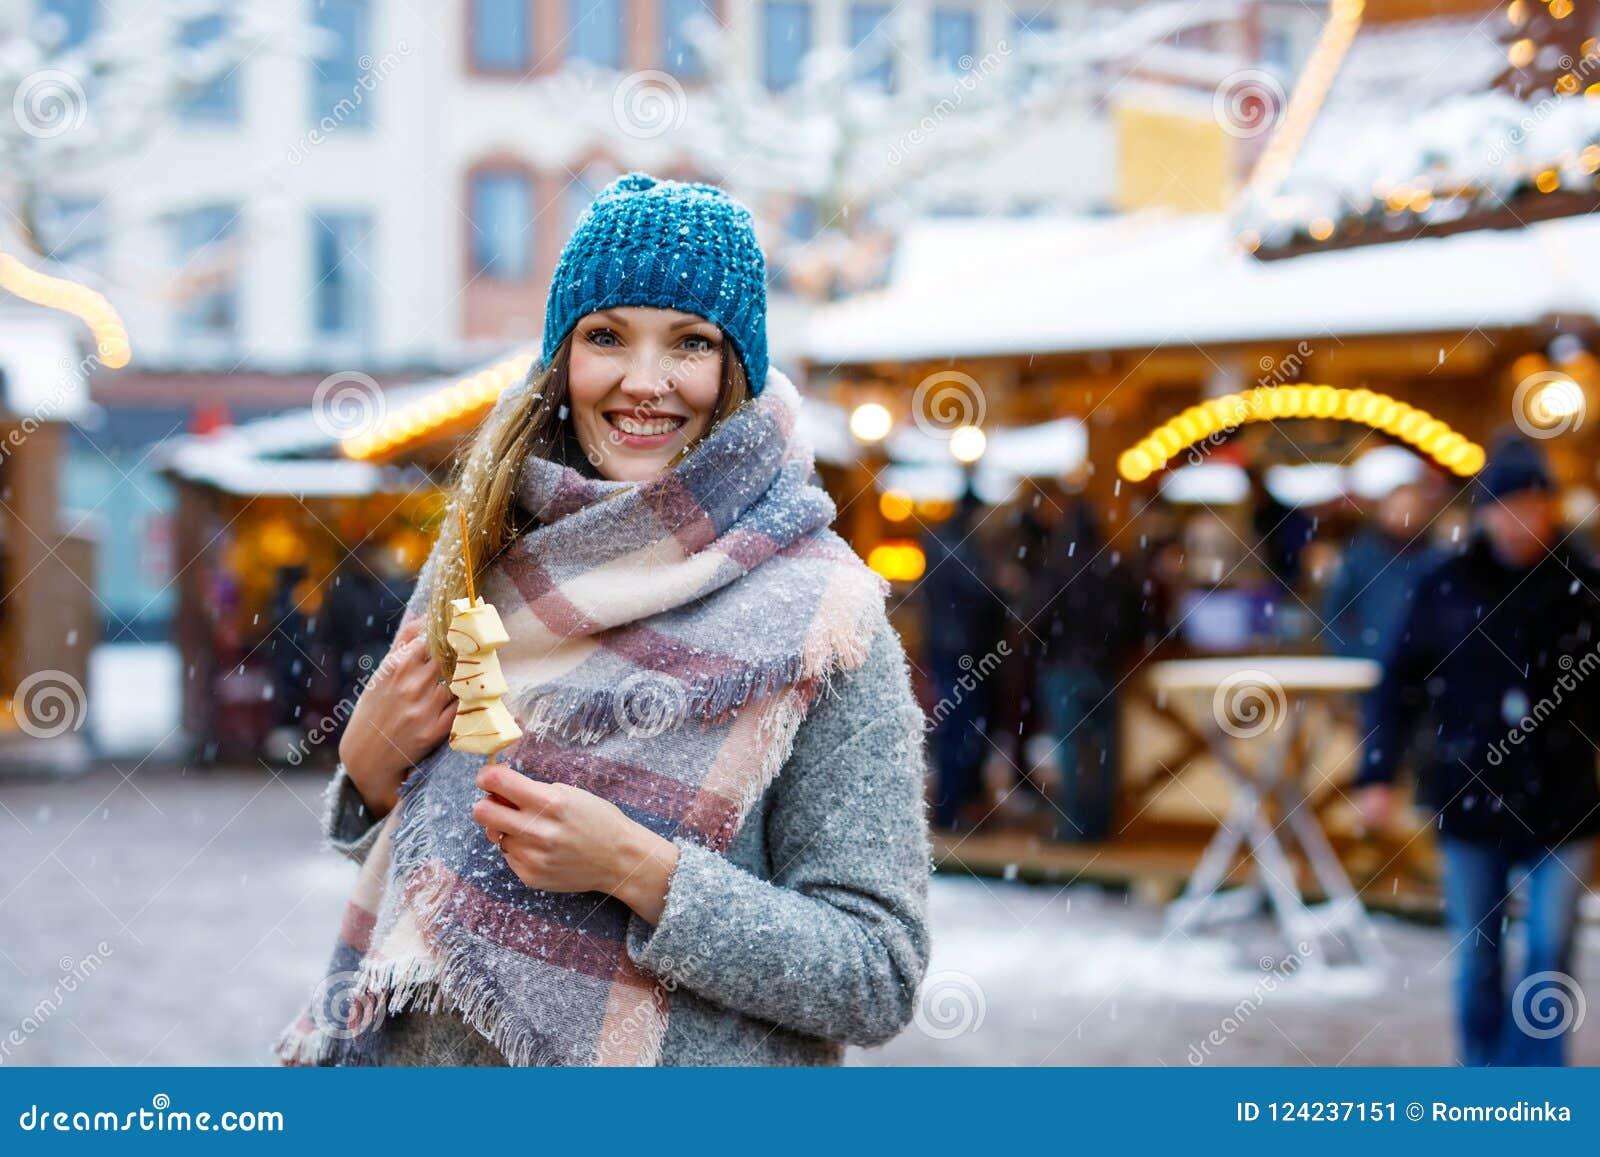 cute girl Germany Romantic in